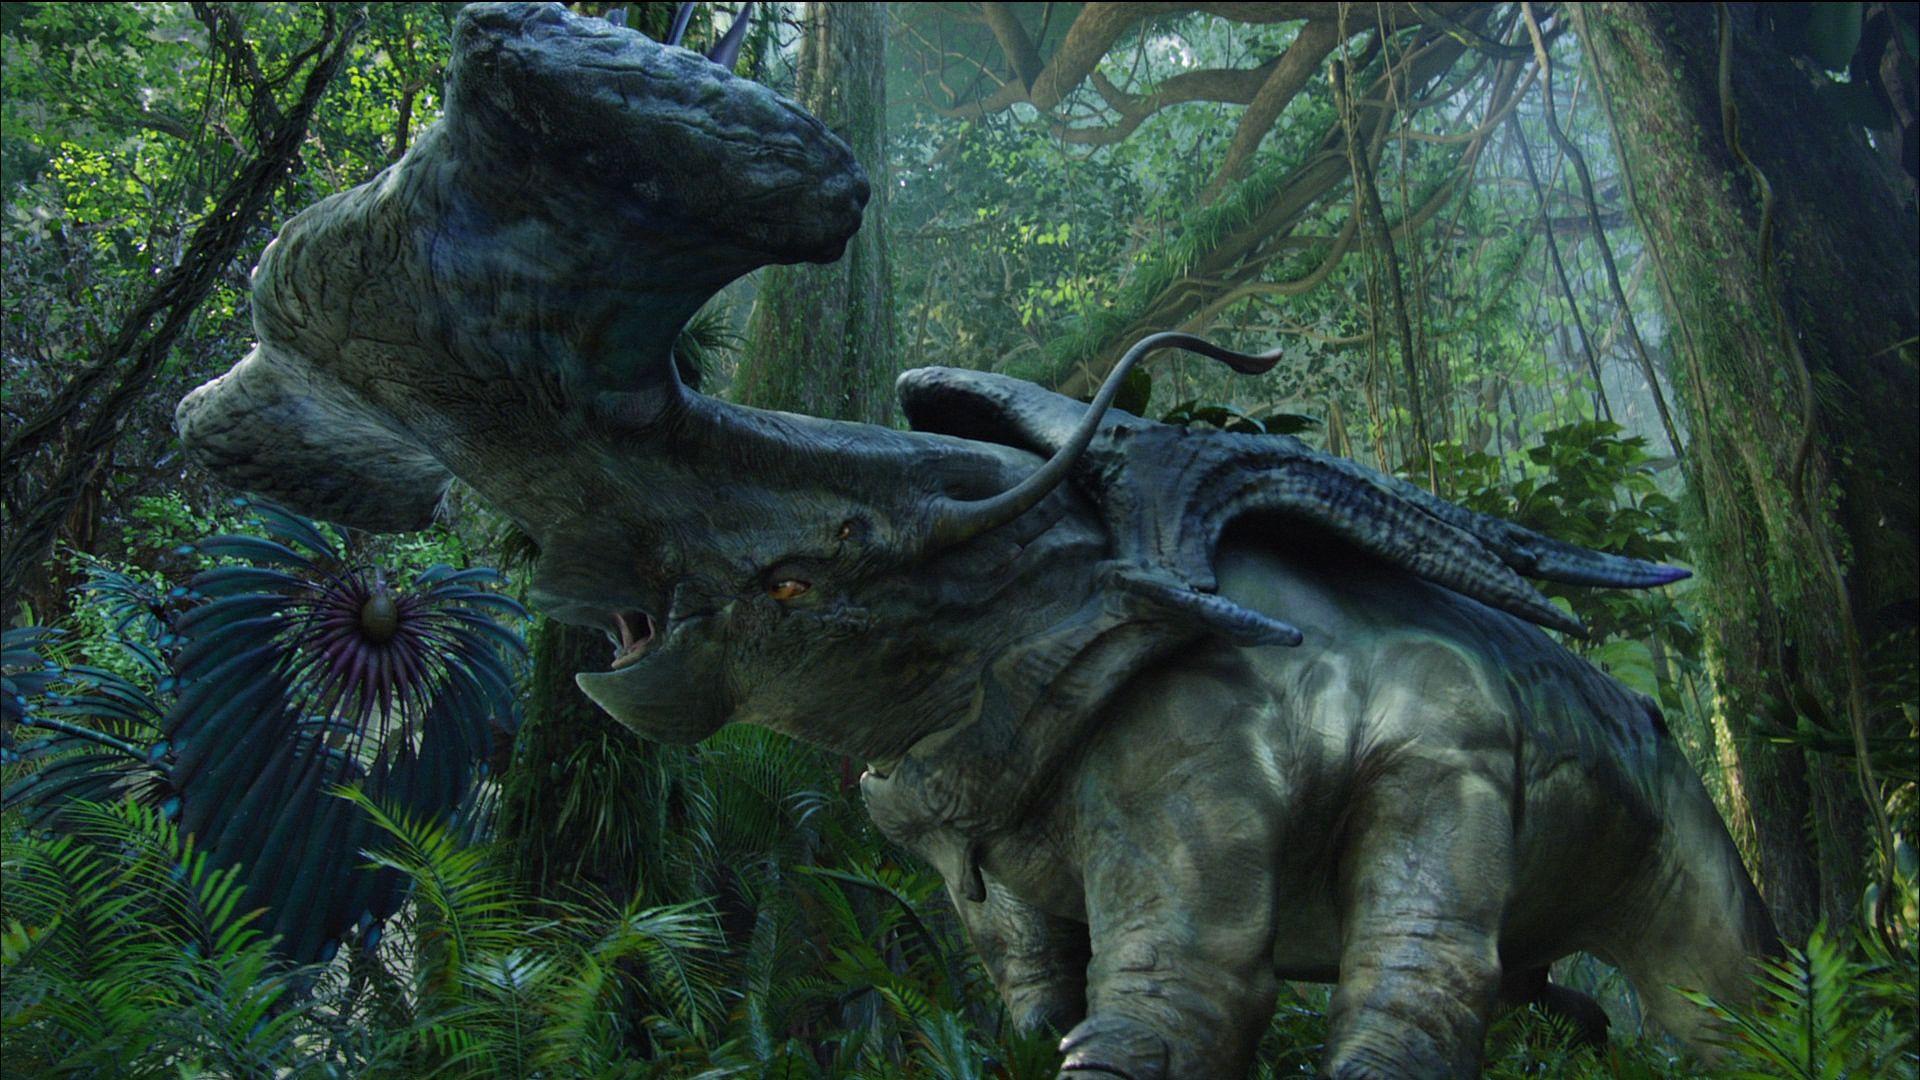 File:Hammerheadtitanothere.jpg